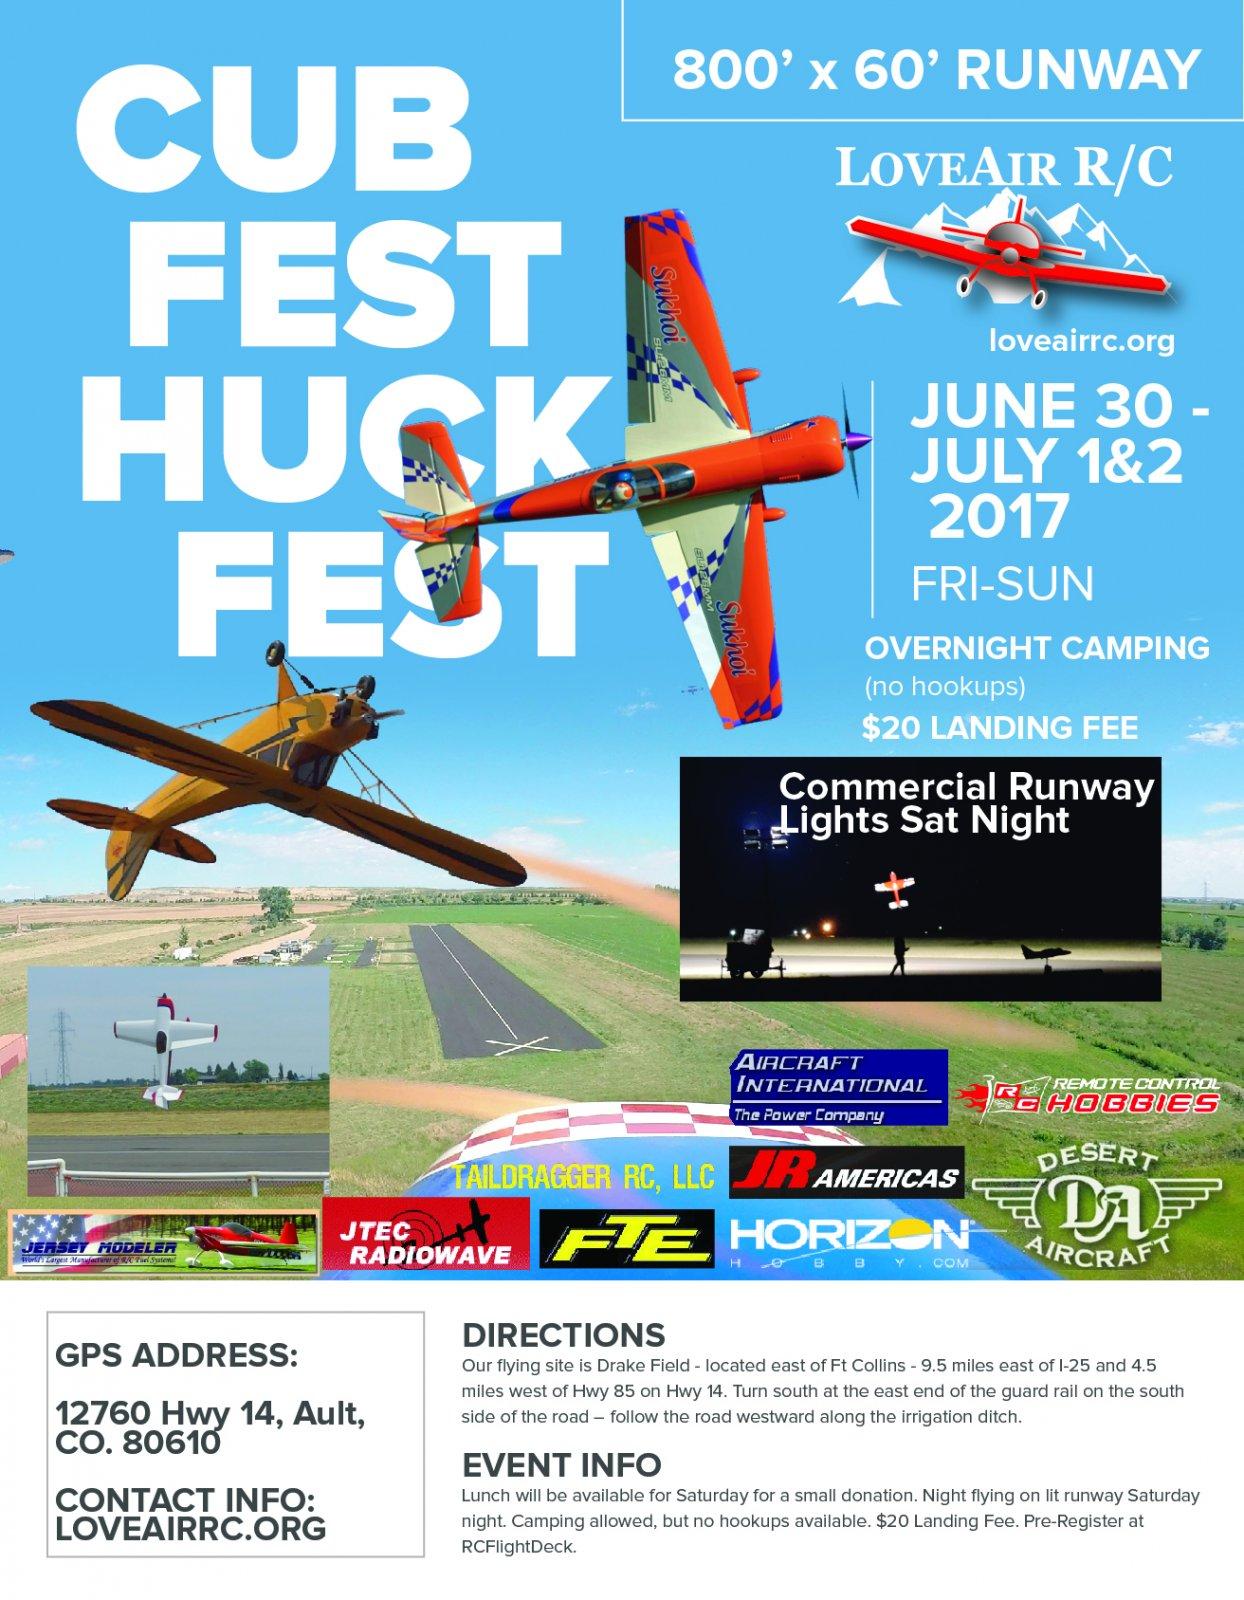 Cub Fest Huck Fest - Flyer 2017-01.jpg